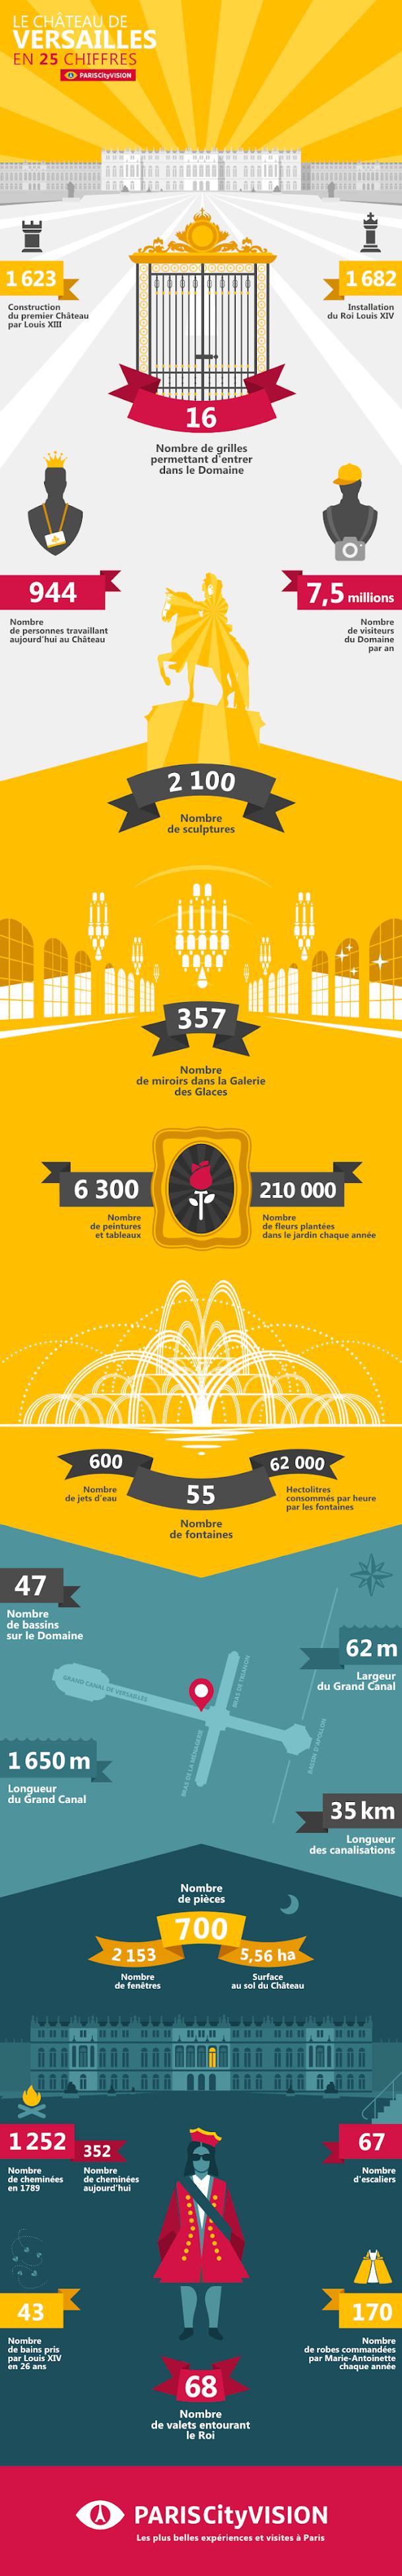 https://cdn.pariscityvision.com/media/wysiwyg/infographie_versailles_fr_1.png